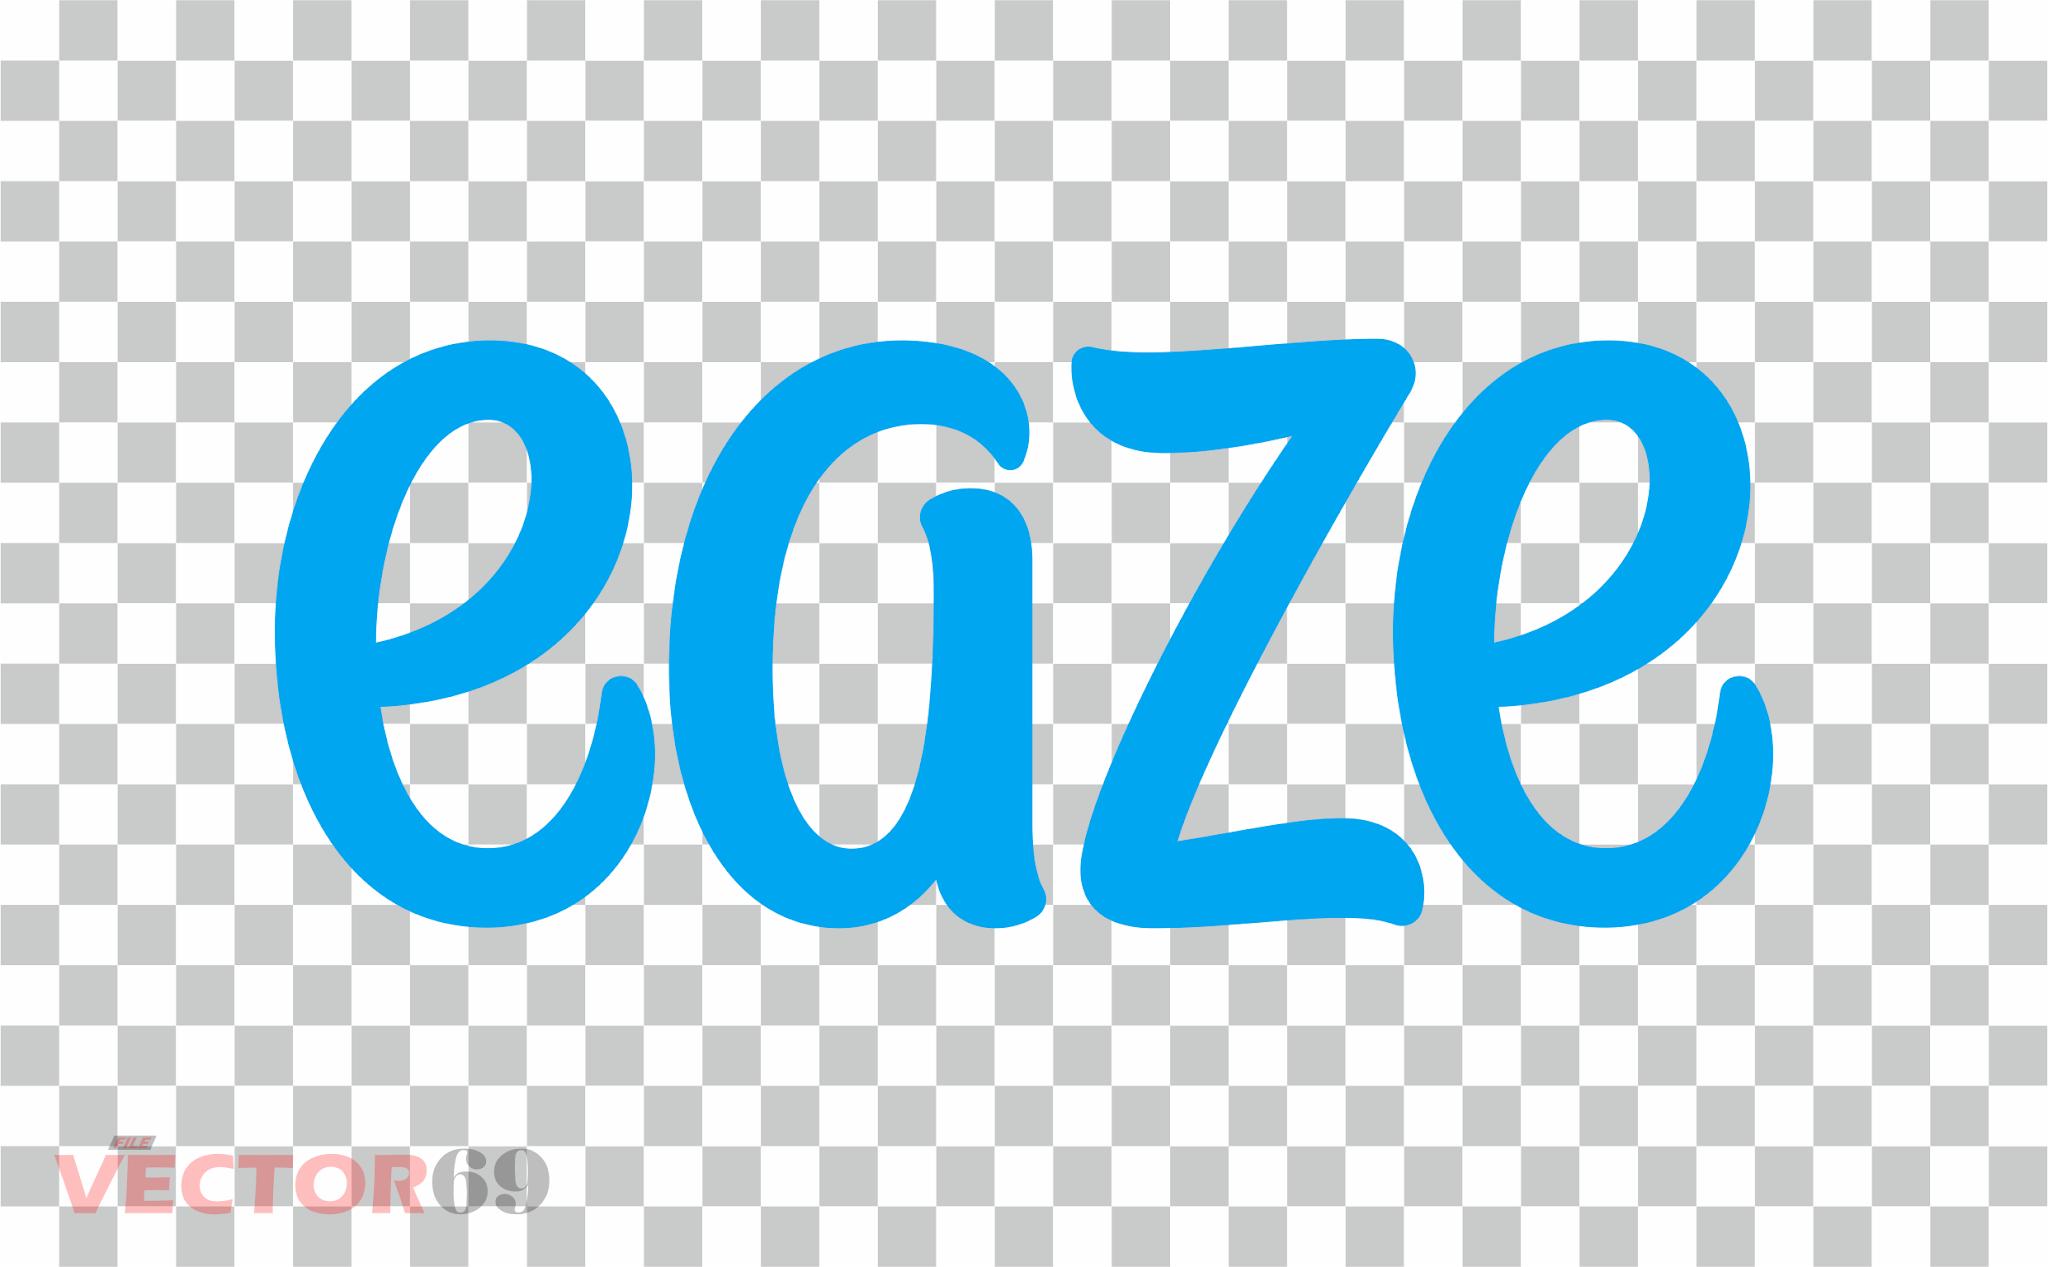 Eaze Logo - Download Vector File PNG (Portable Network Graphics)